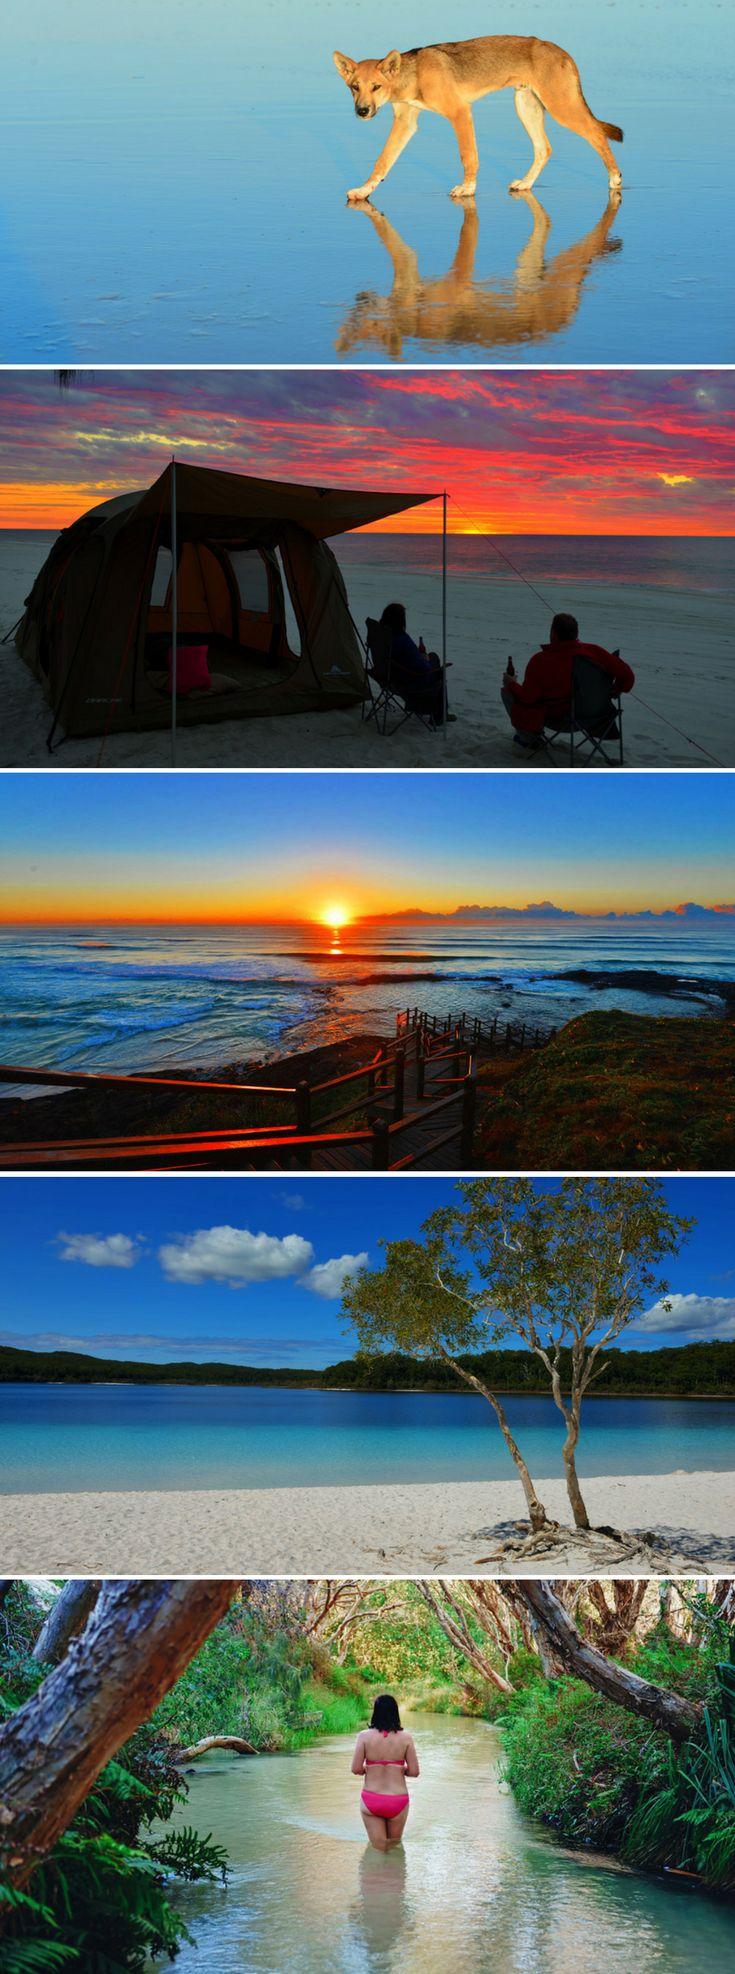 Tips for an adventure on Fraser Island, Australia